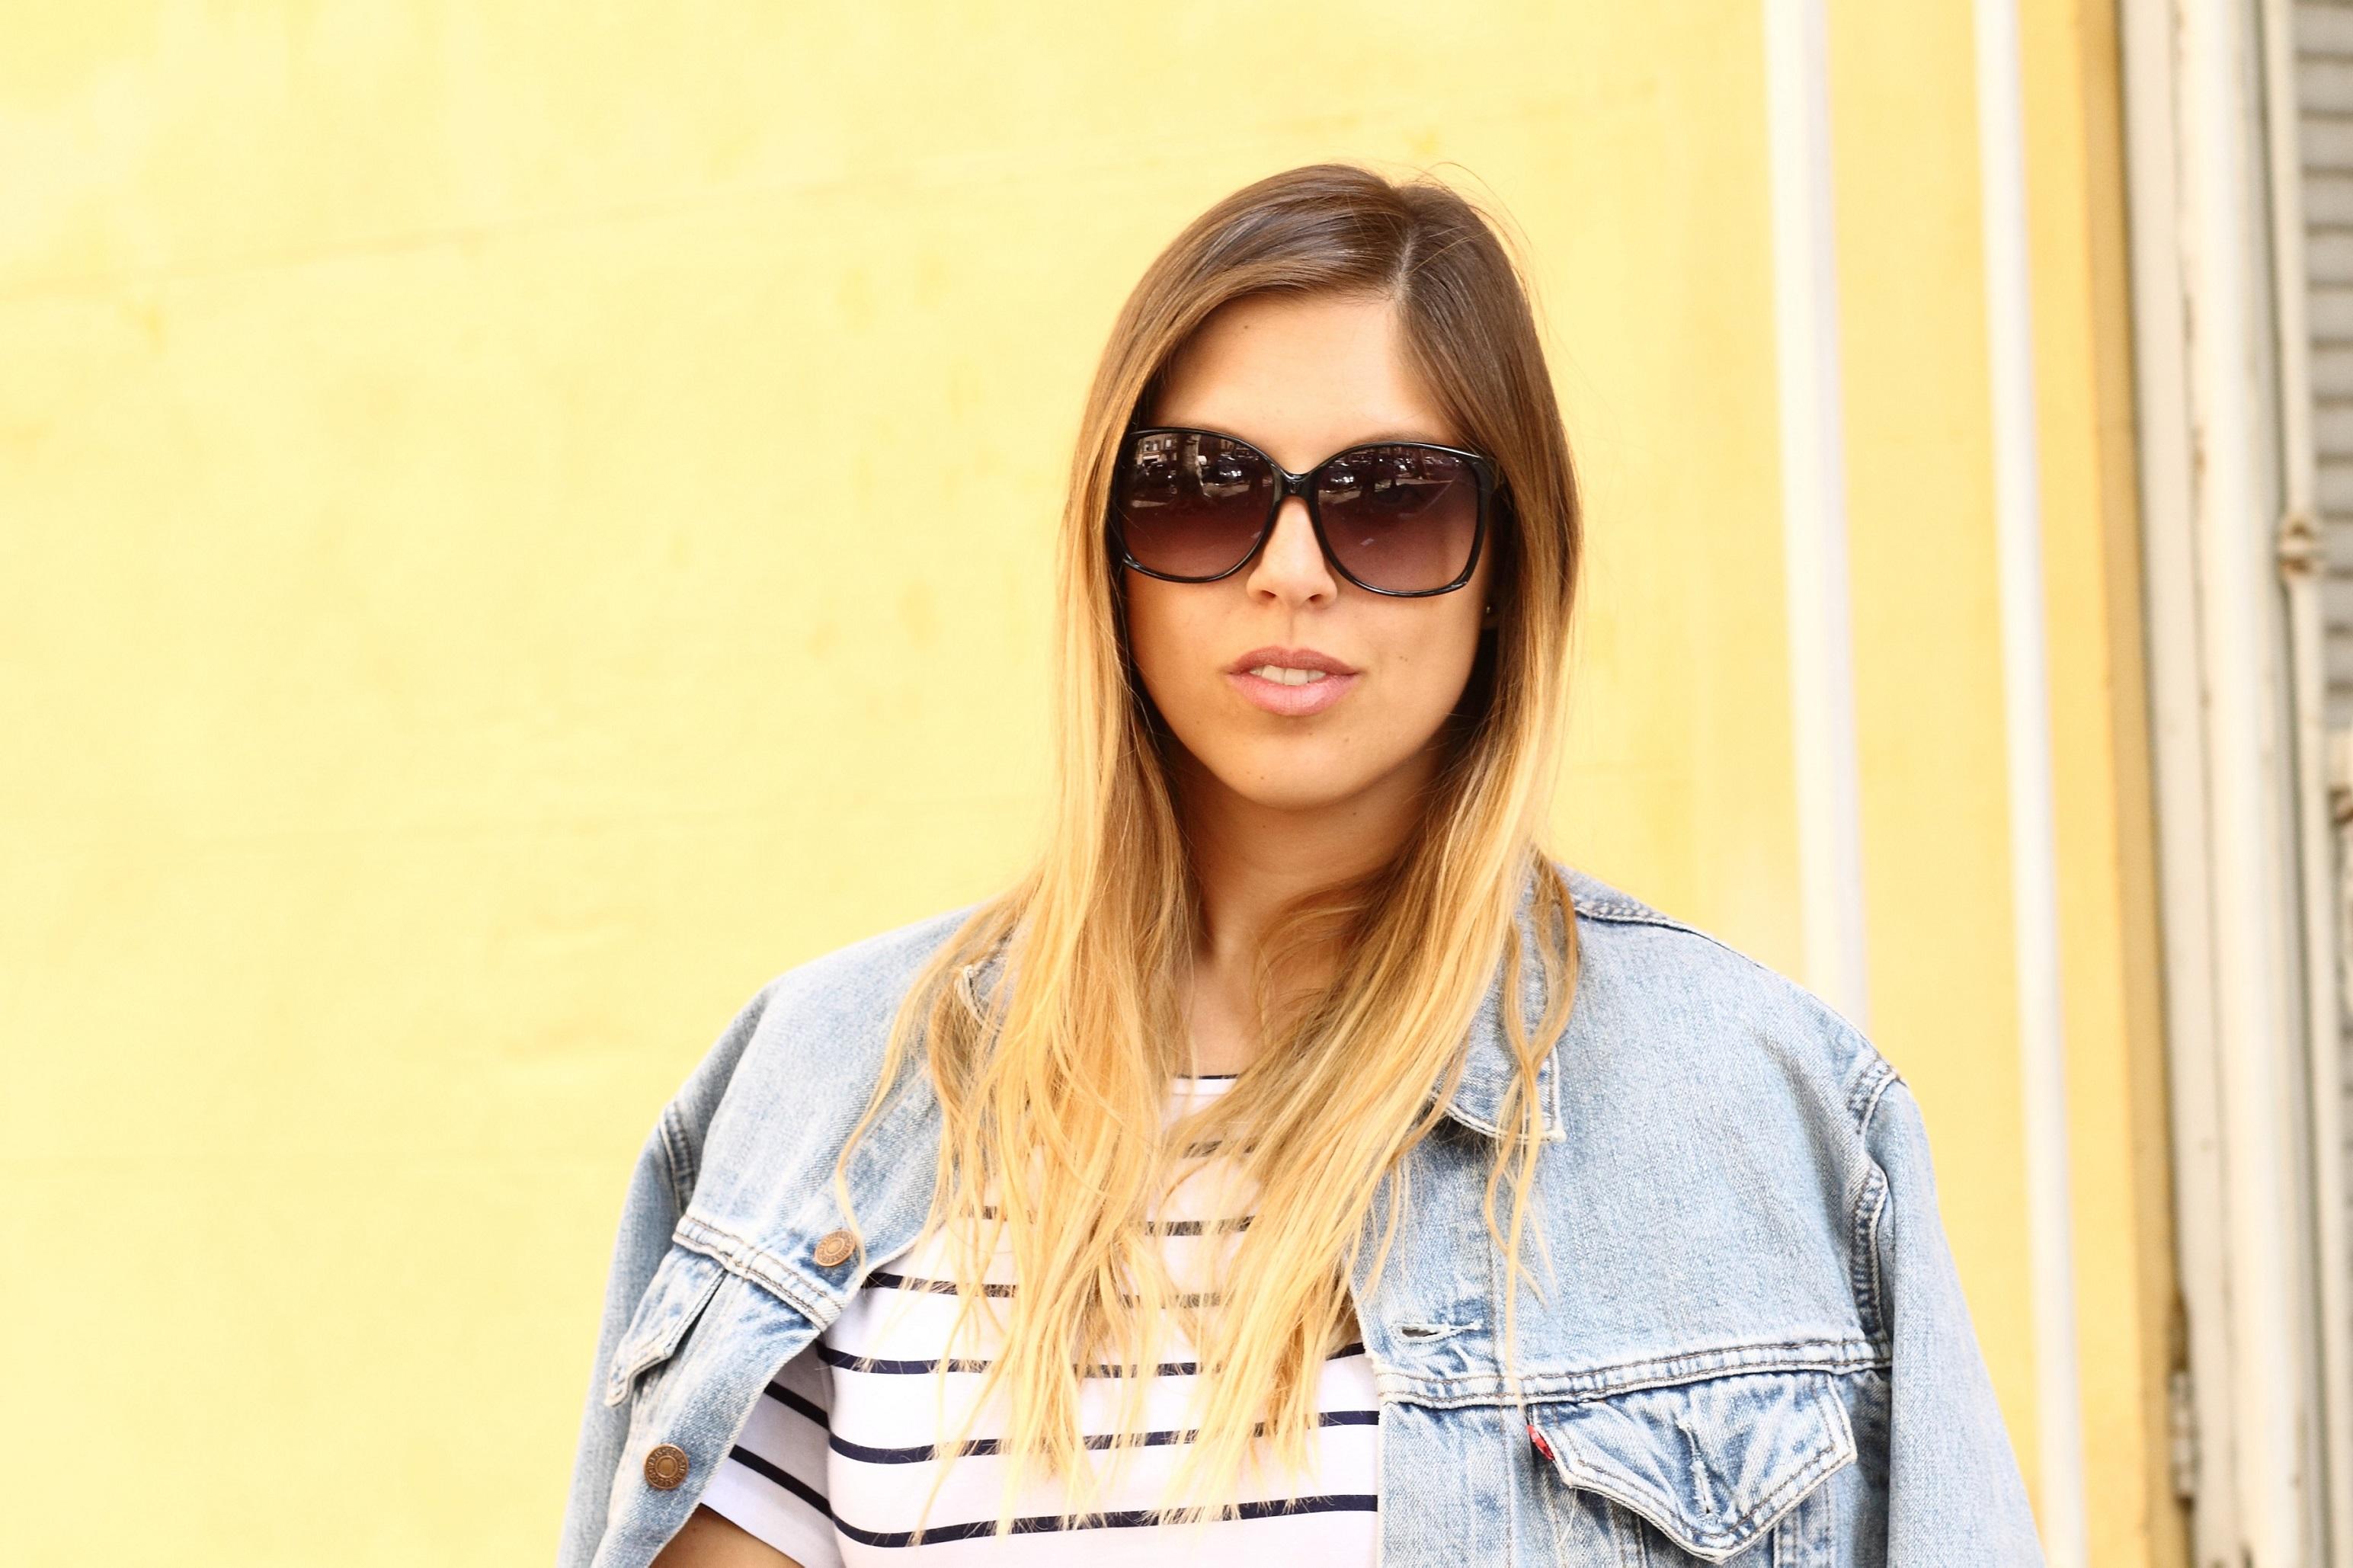 striped shirt denim jacket sunglasses